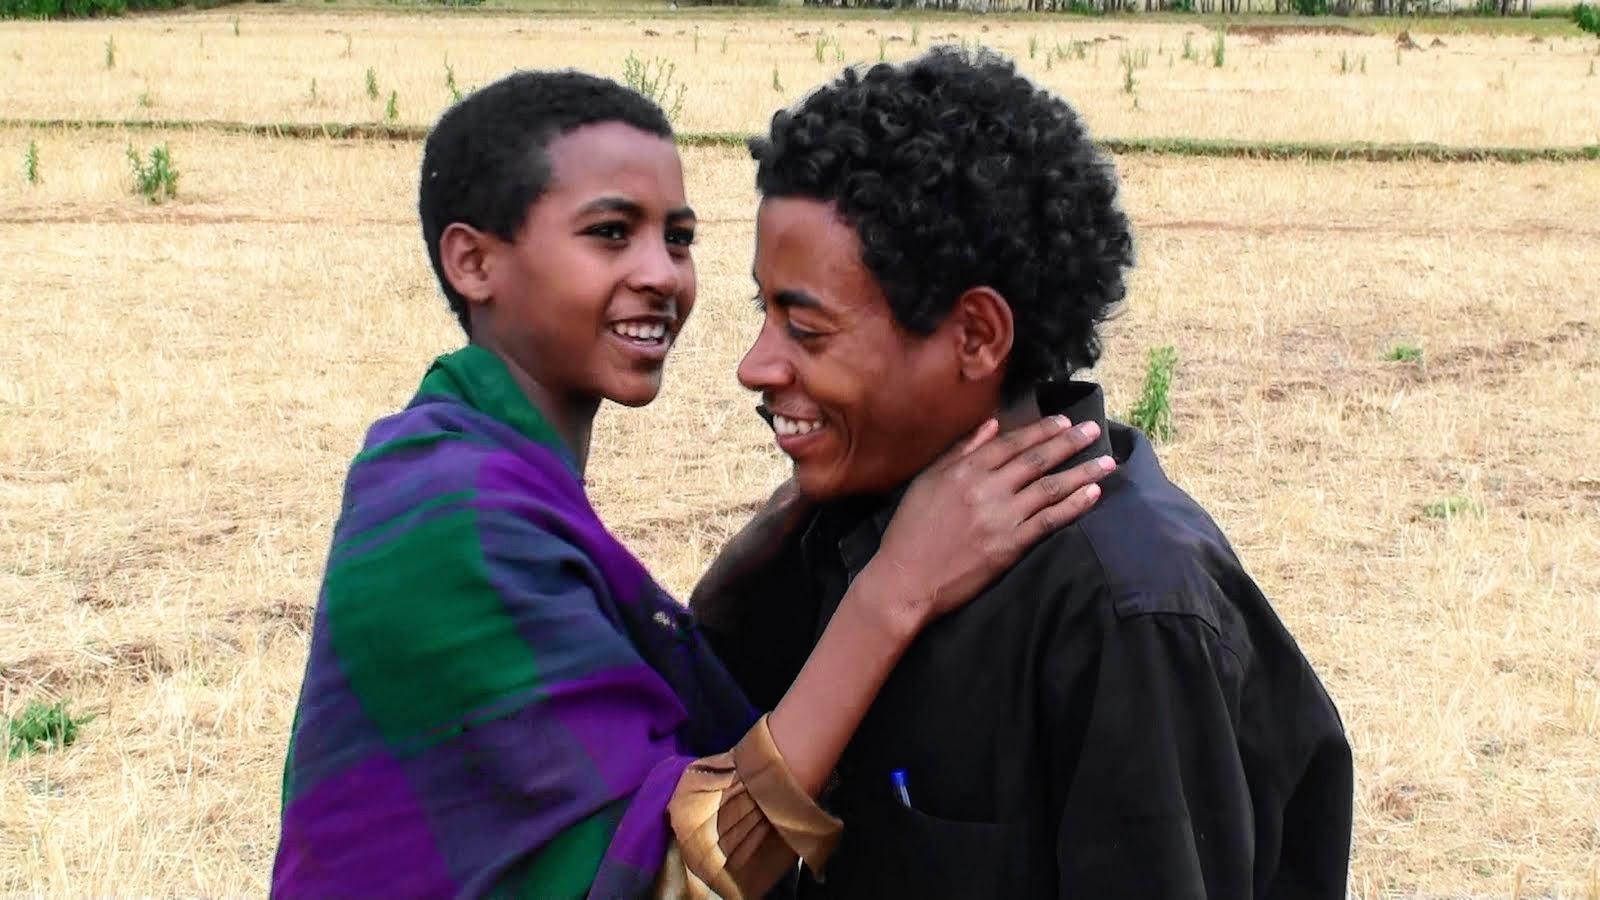 Tesfaye and sister Fanteye embrace